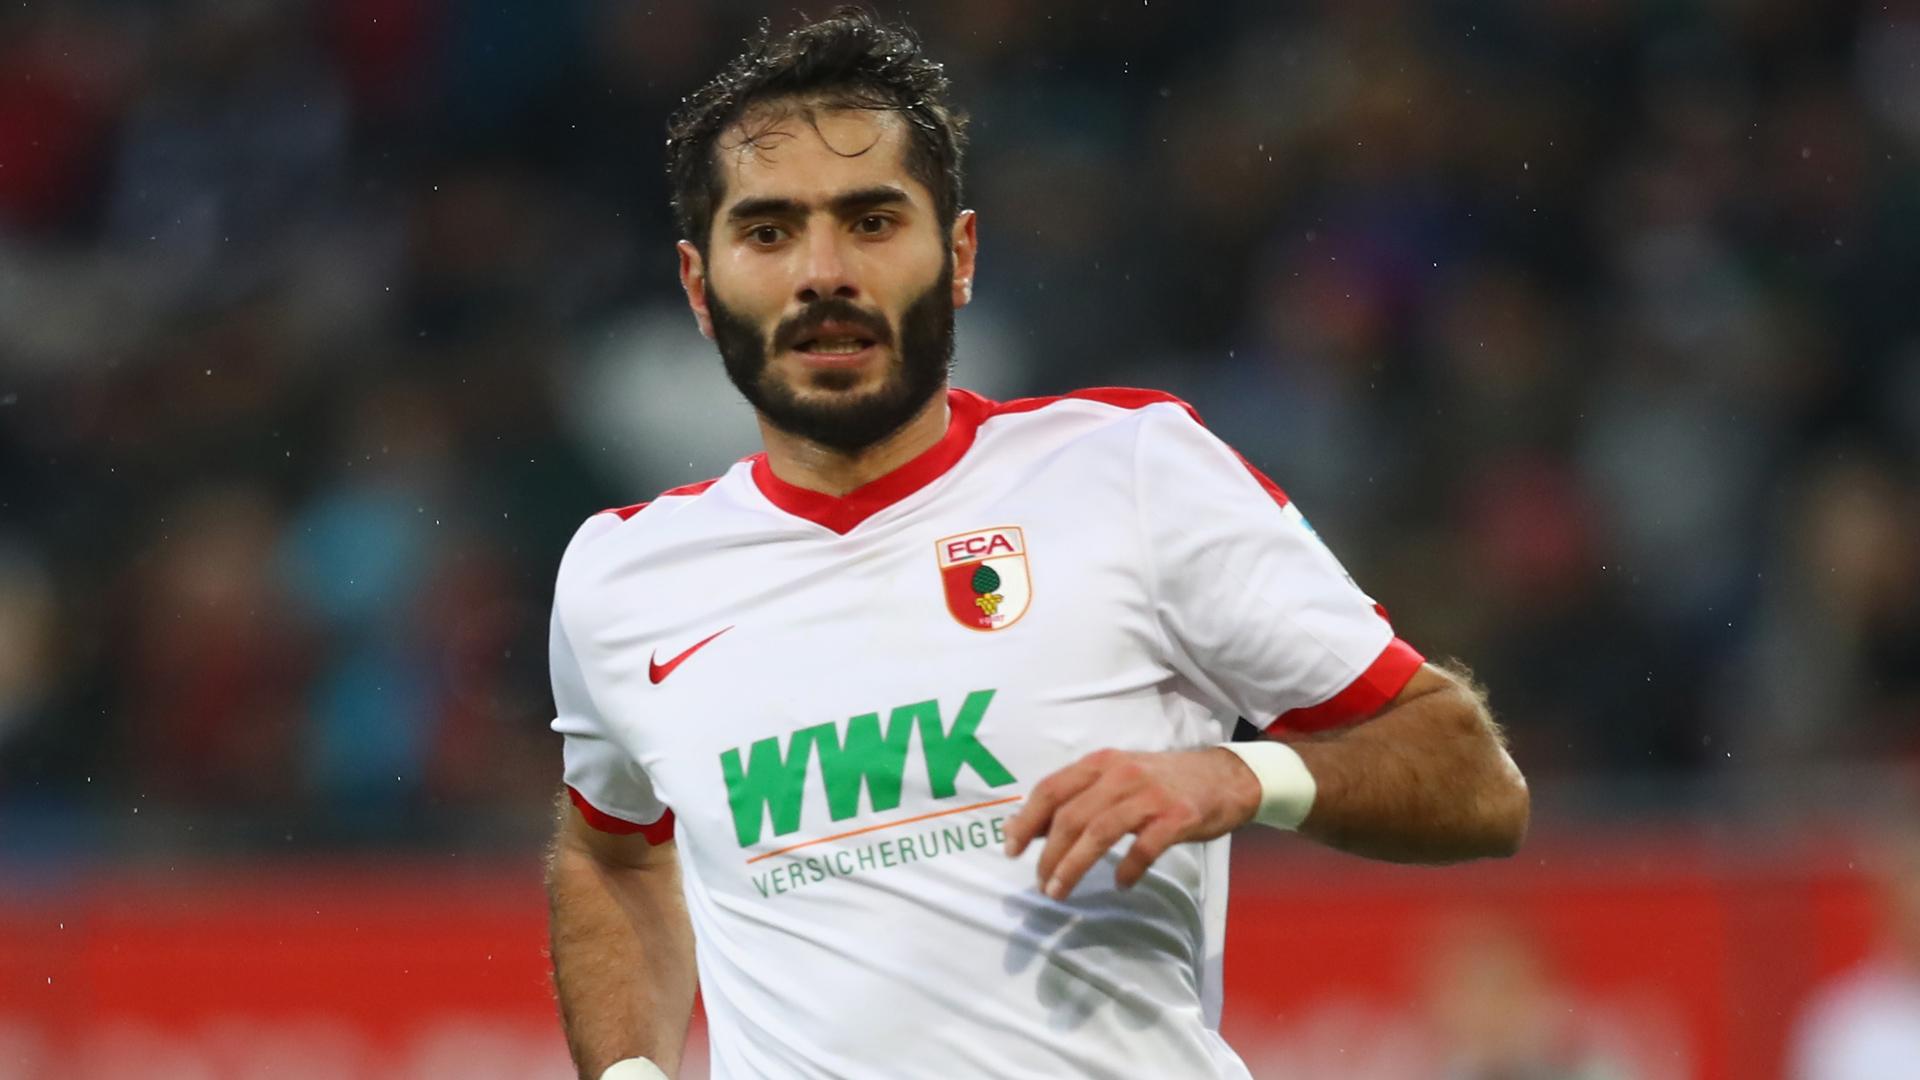 Halil Altintop kehrt zum FCK zurück